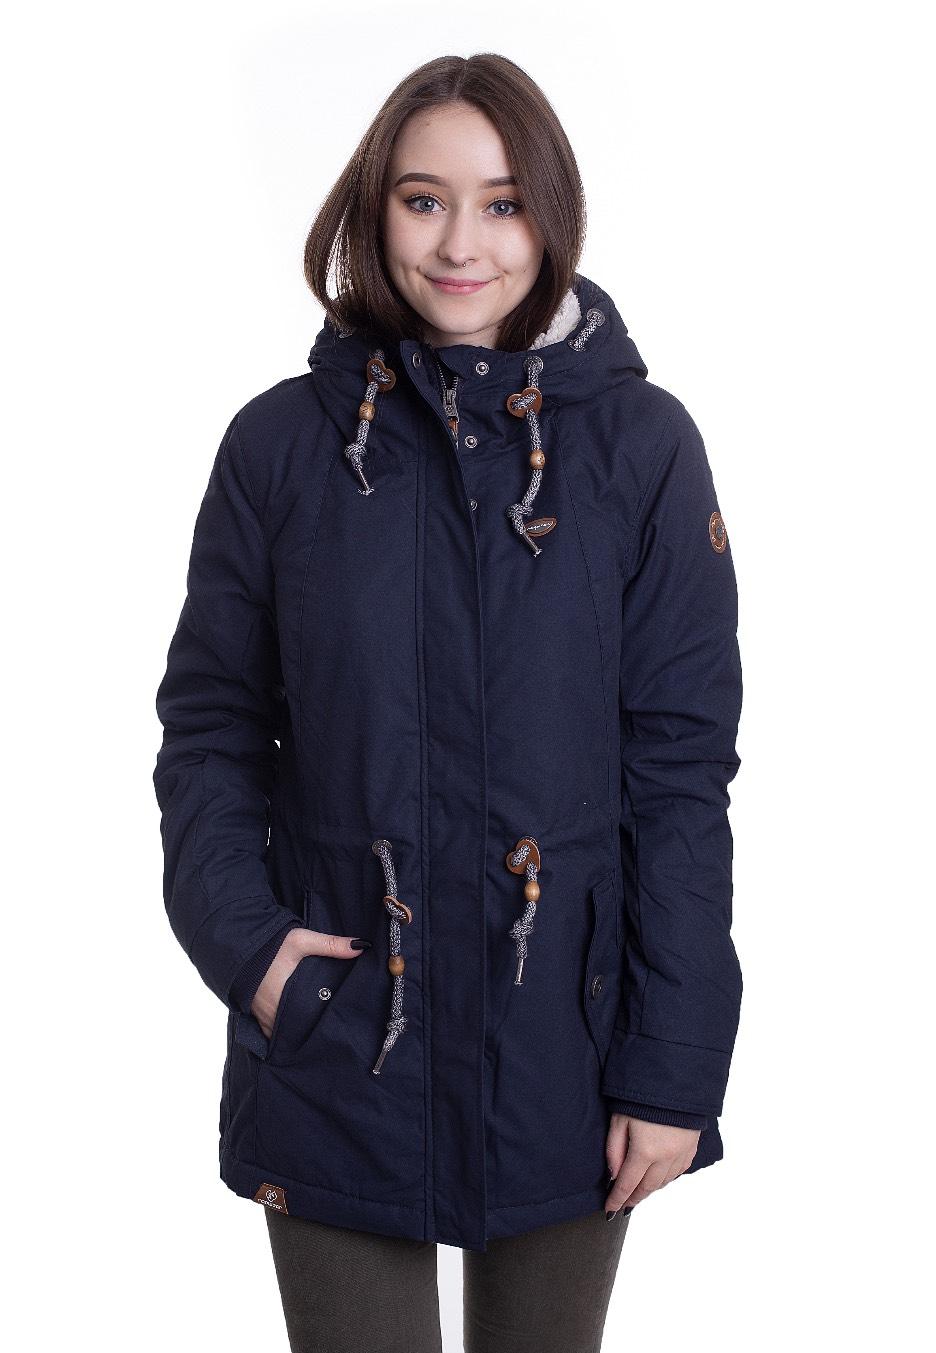 Jacken - Ragwear Monadis Navy Jacken  - Onlineshop IMPERICON